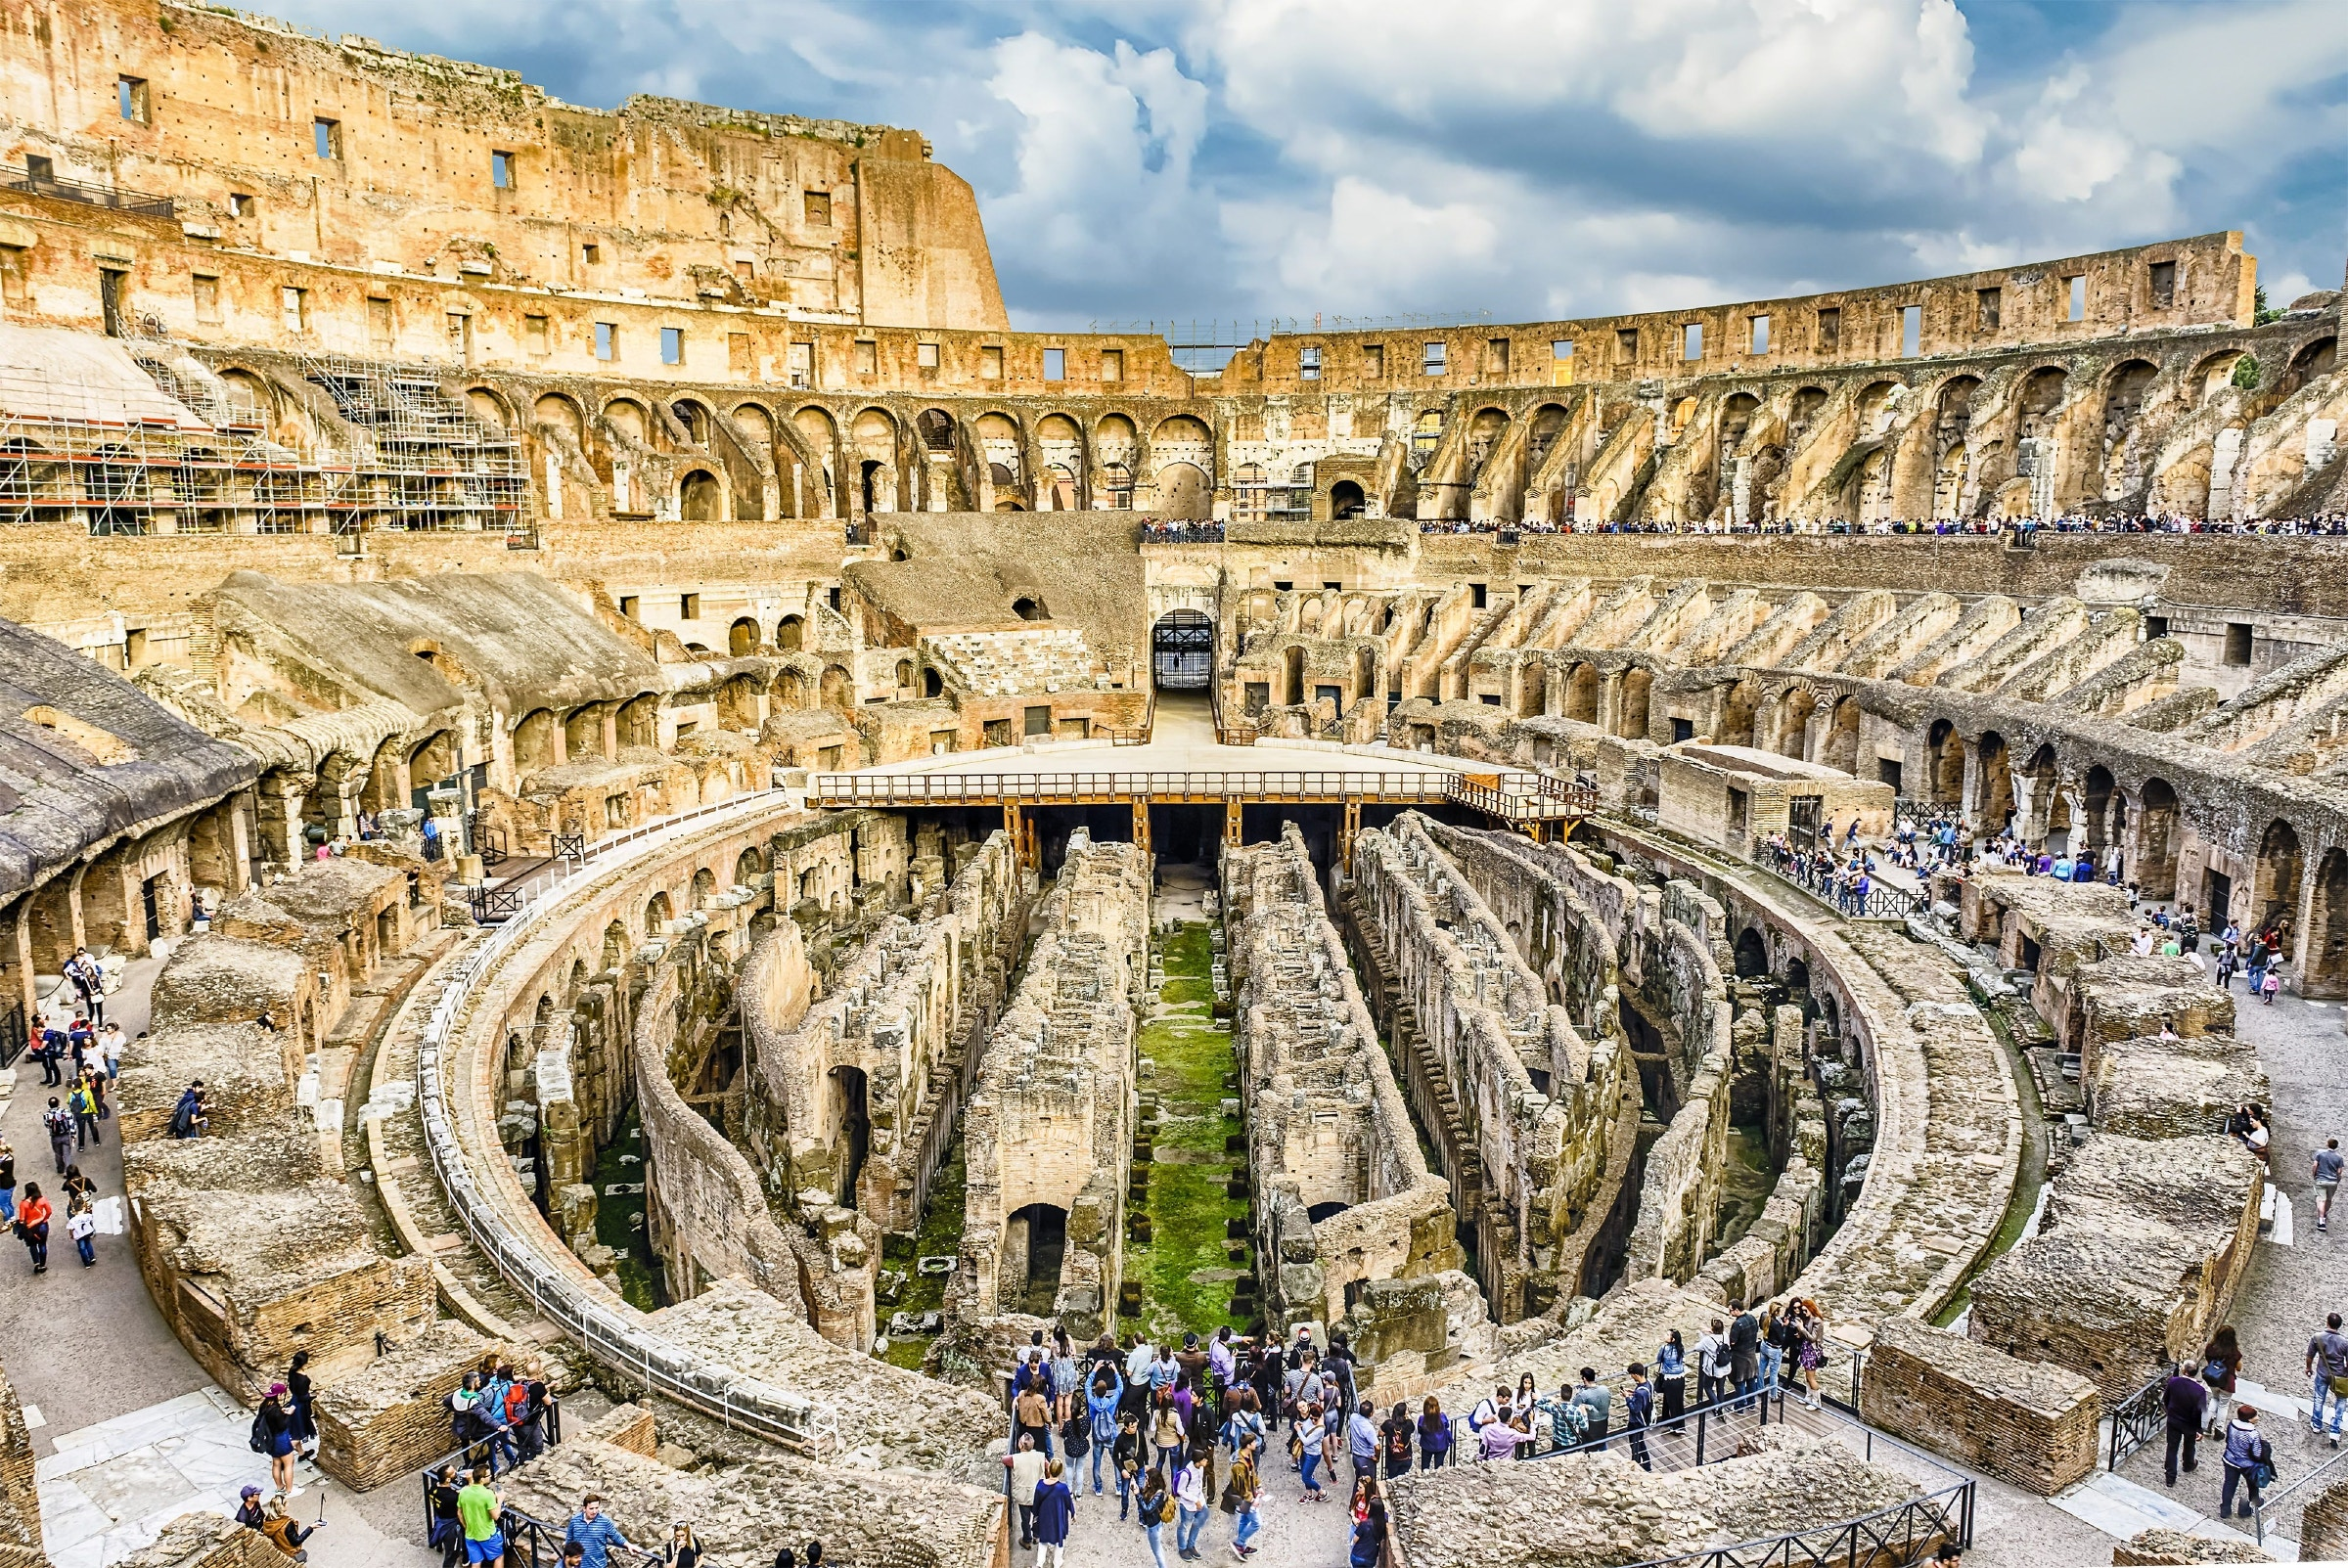 Panoramic view of the Colosseum, Rome © Marco Rubino / Shutterstock